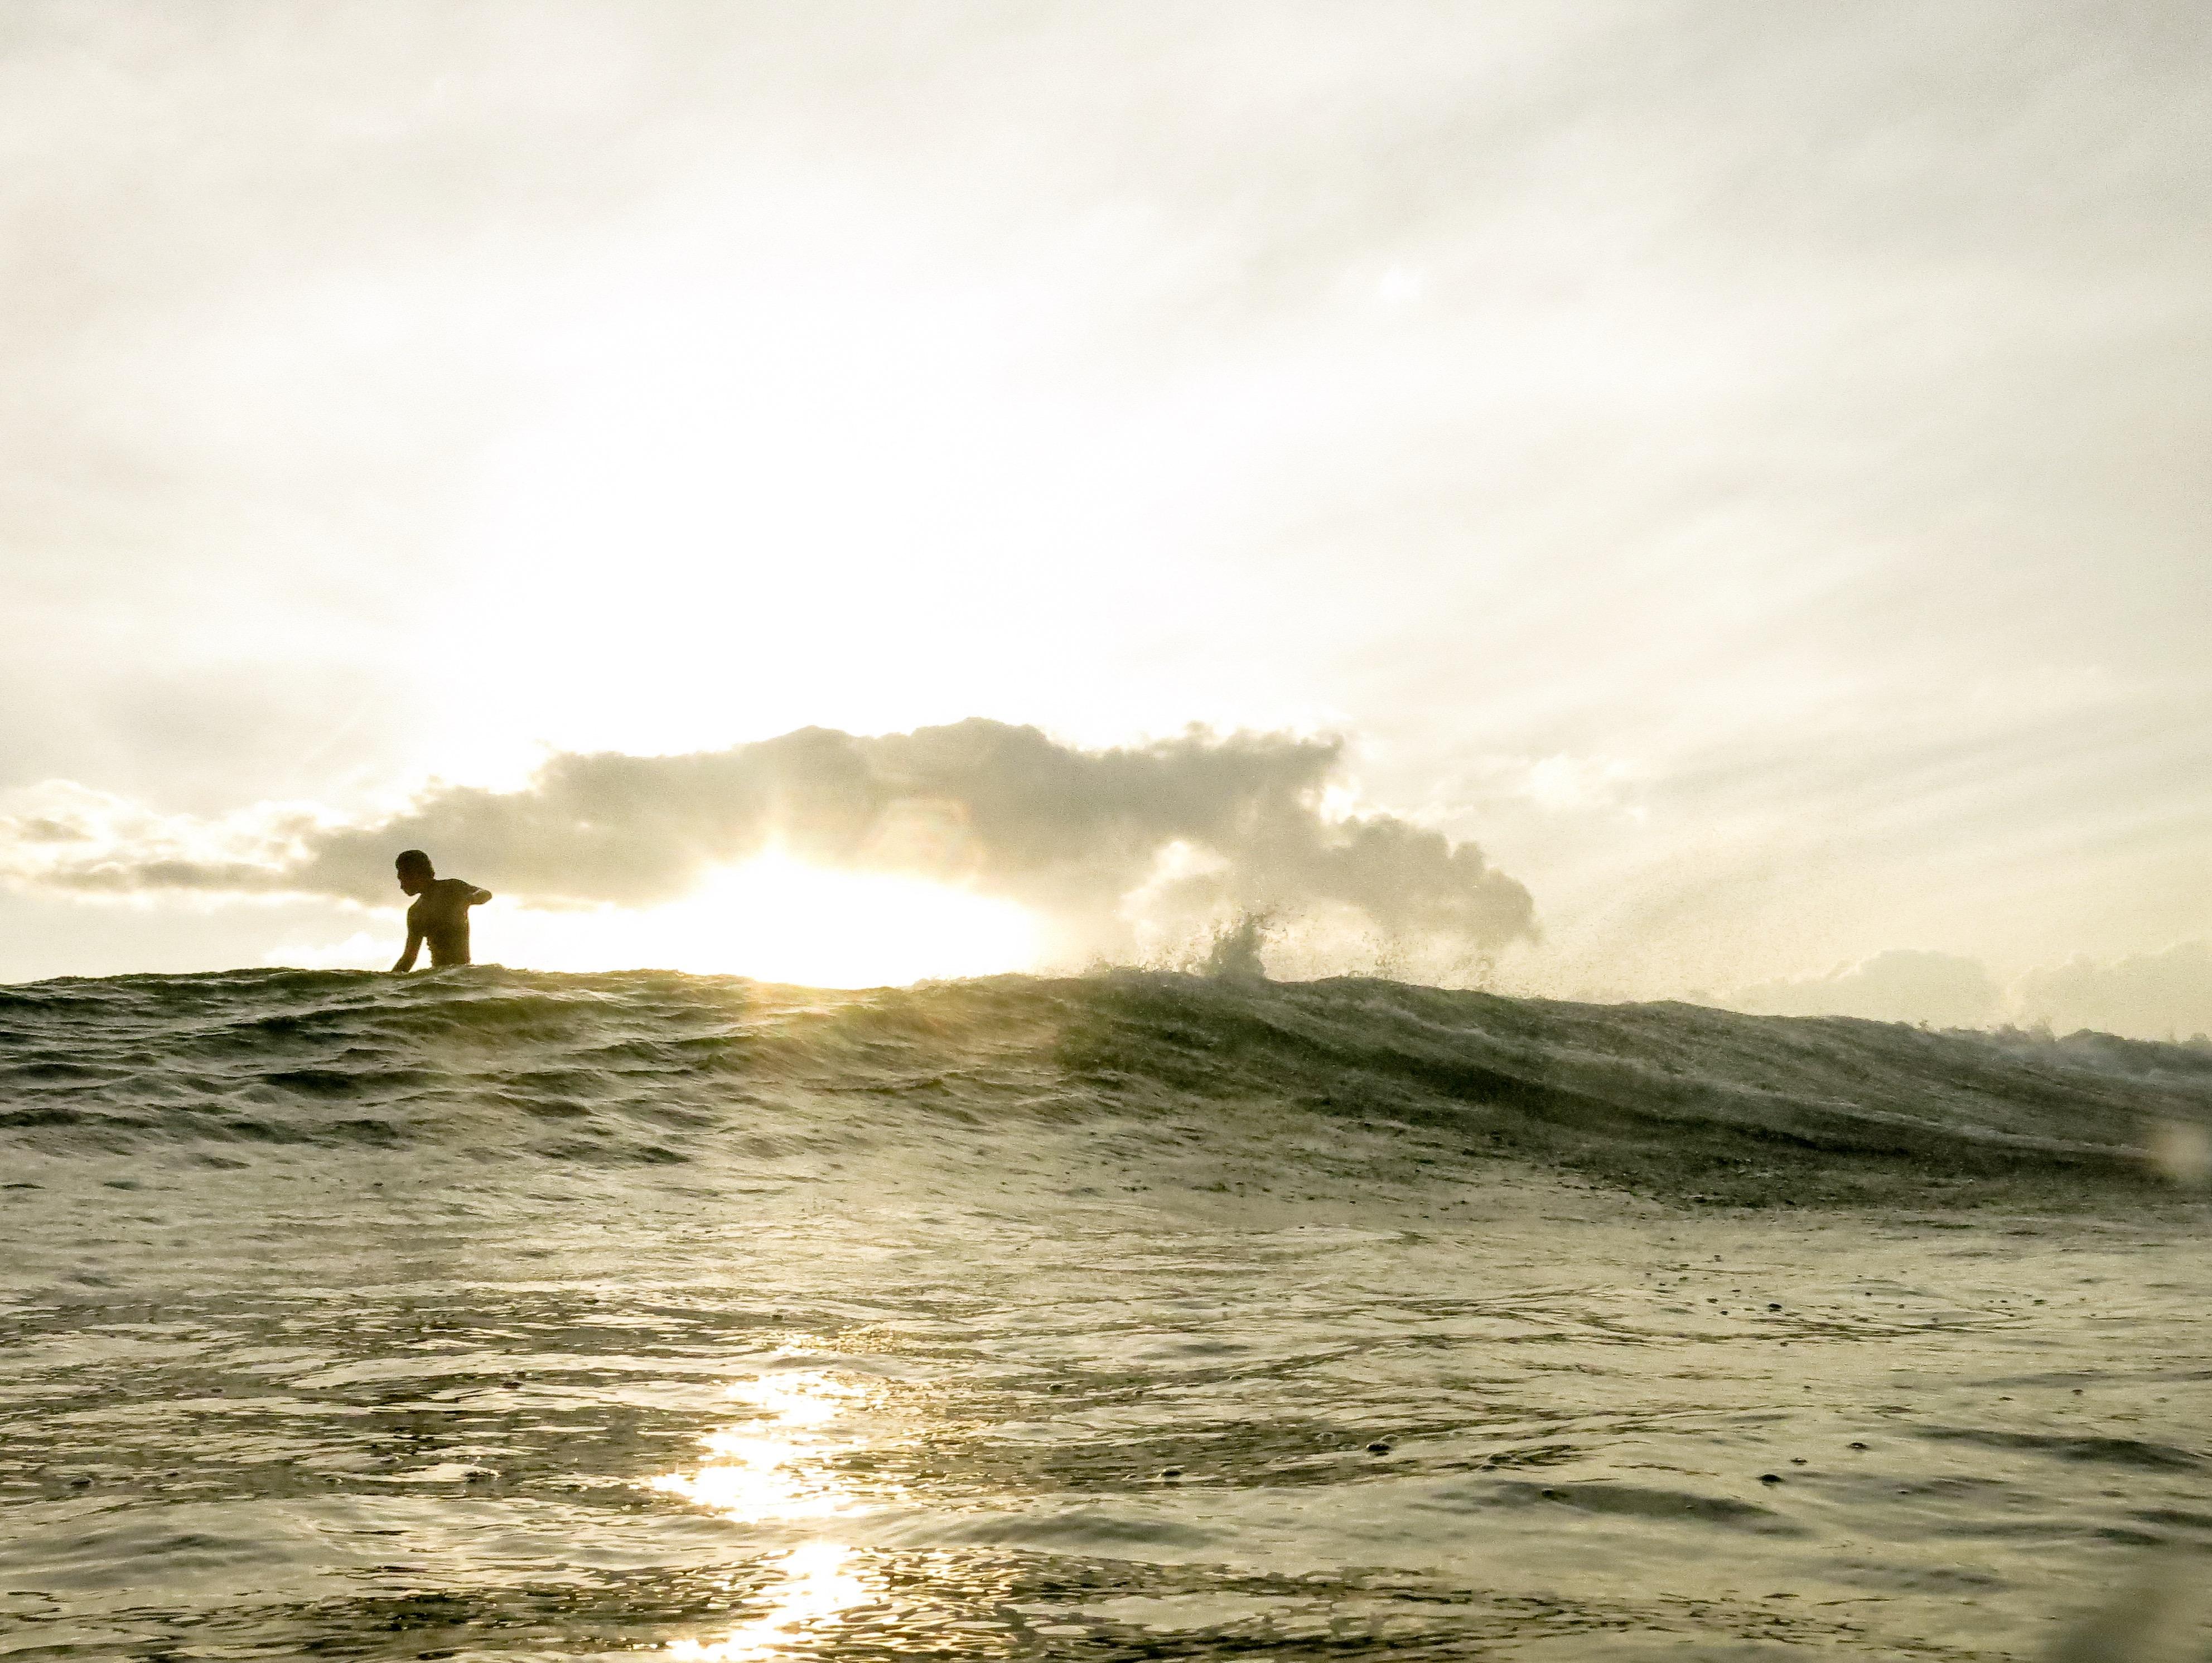 ayok canggu interview photo credit jemma scott mvmnt surf savage thrills